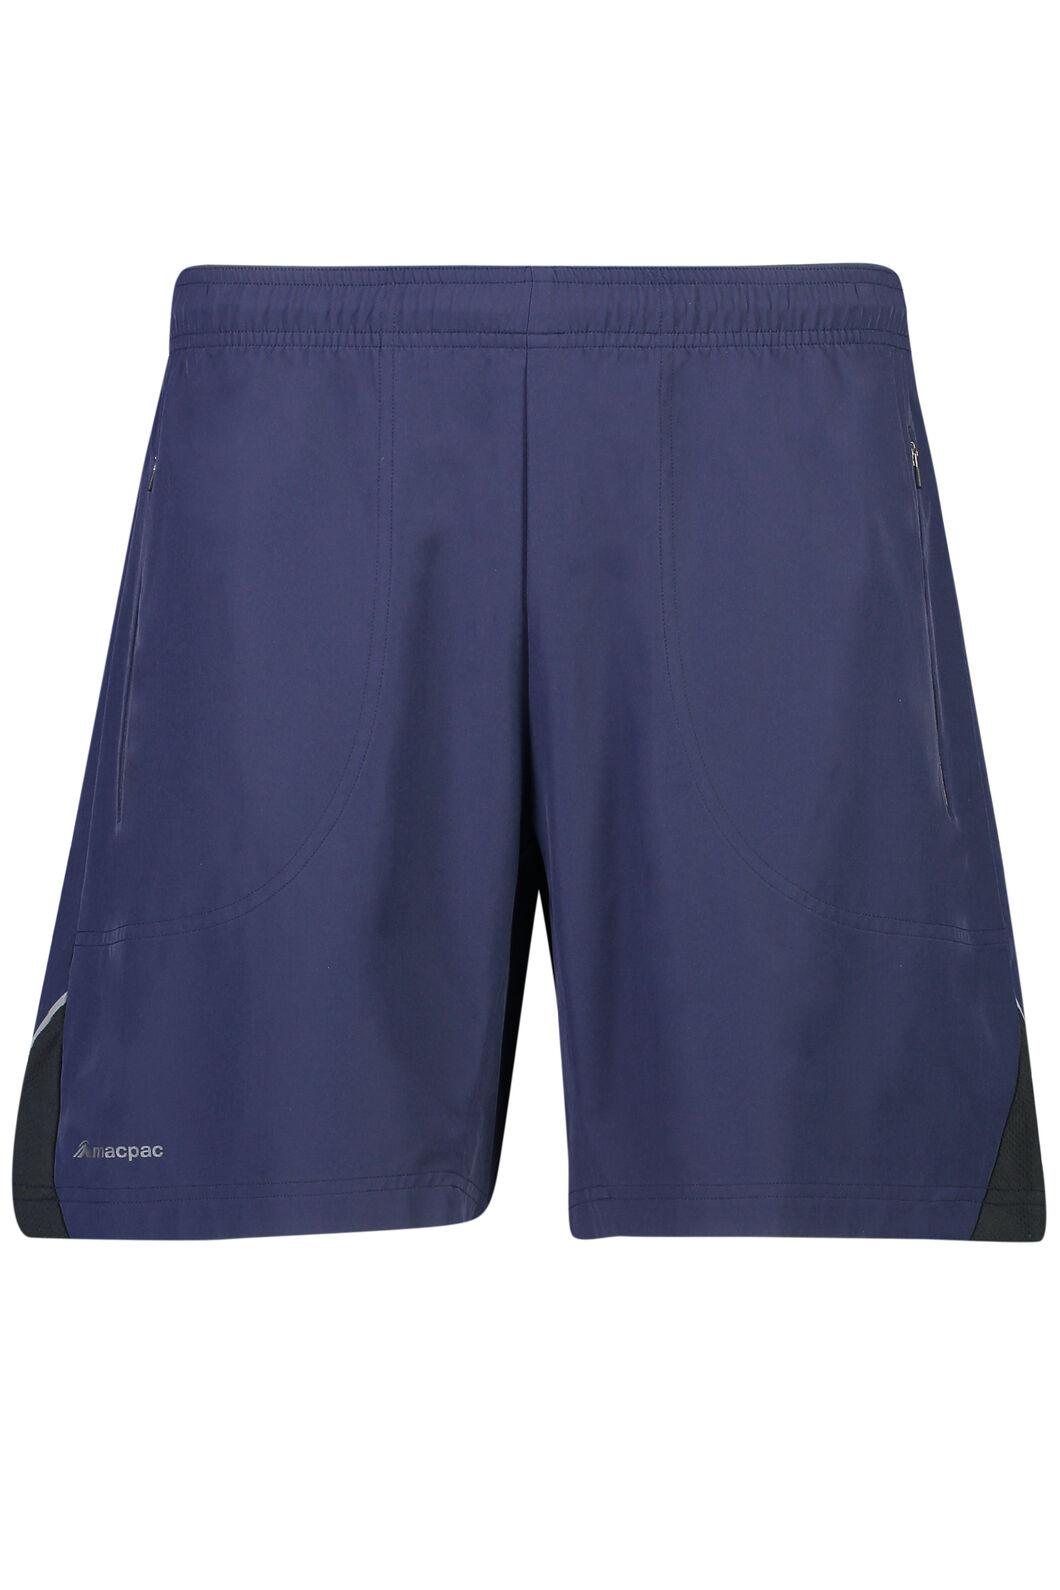 Macpac Fast Track Shorts - Men's, Black Iris, hi-res